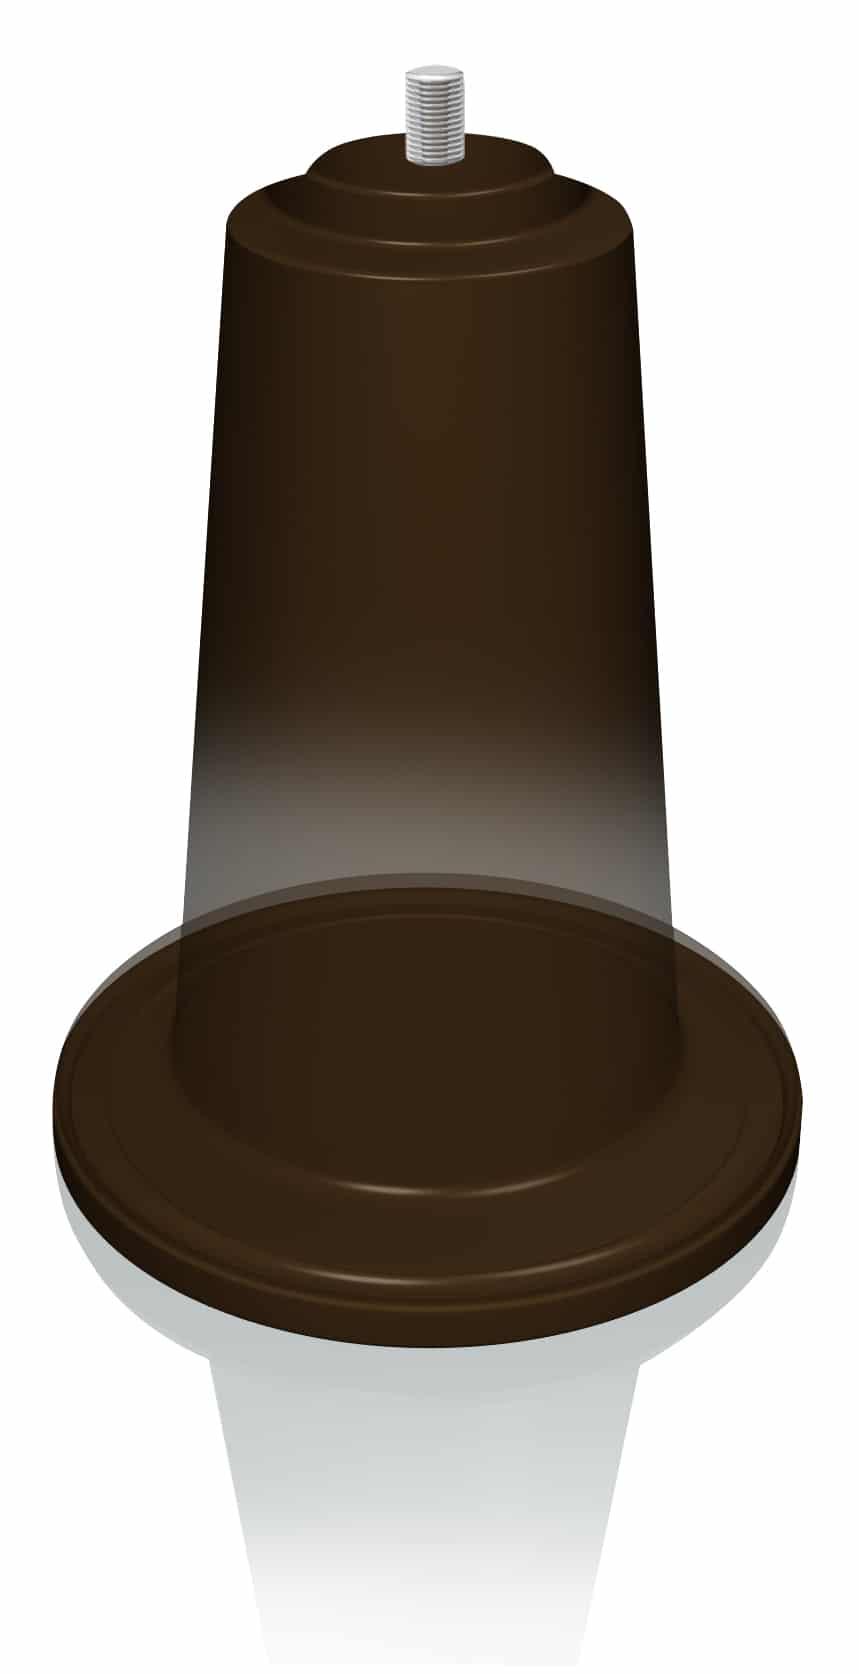 Slipstick gripper glide cup cb885 slipstick foot for Furniture grippers